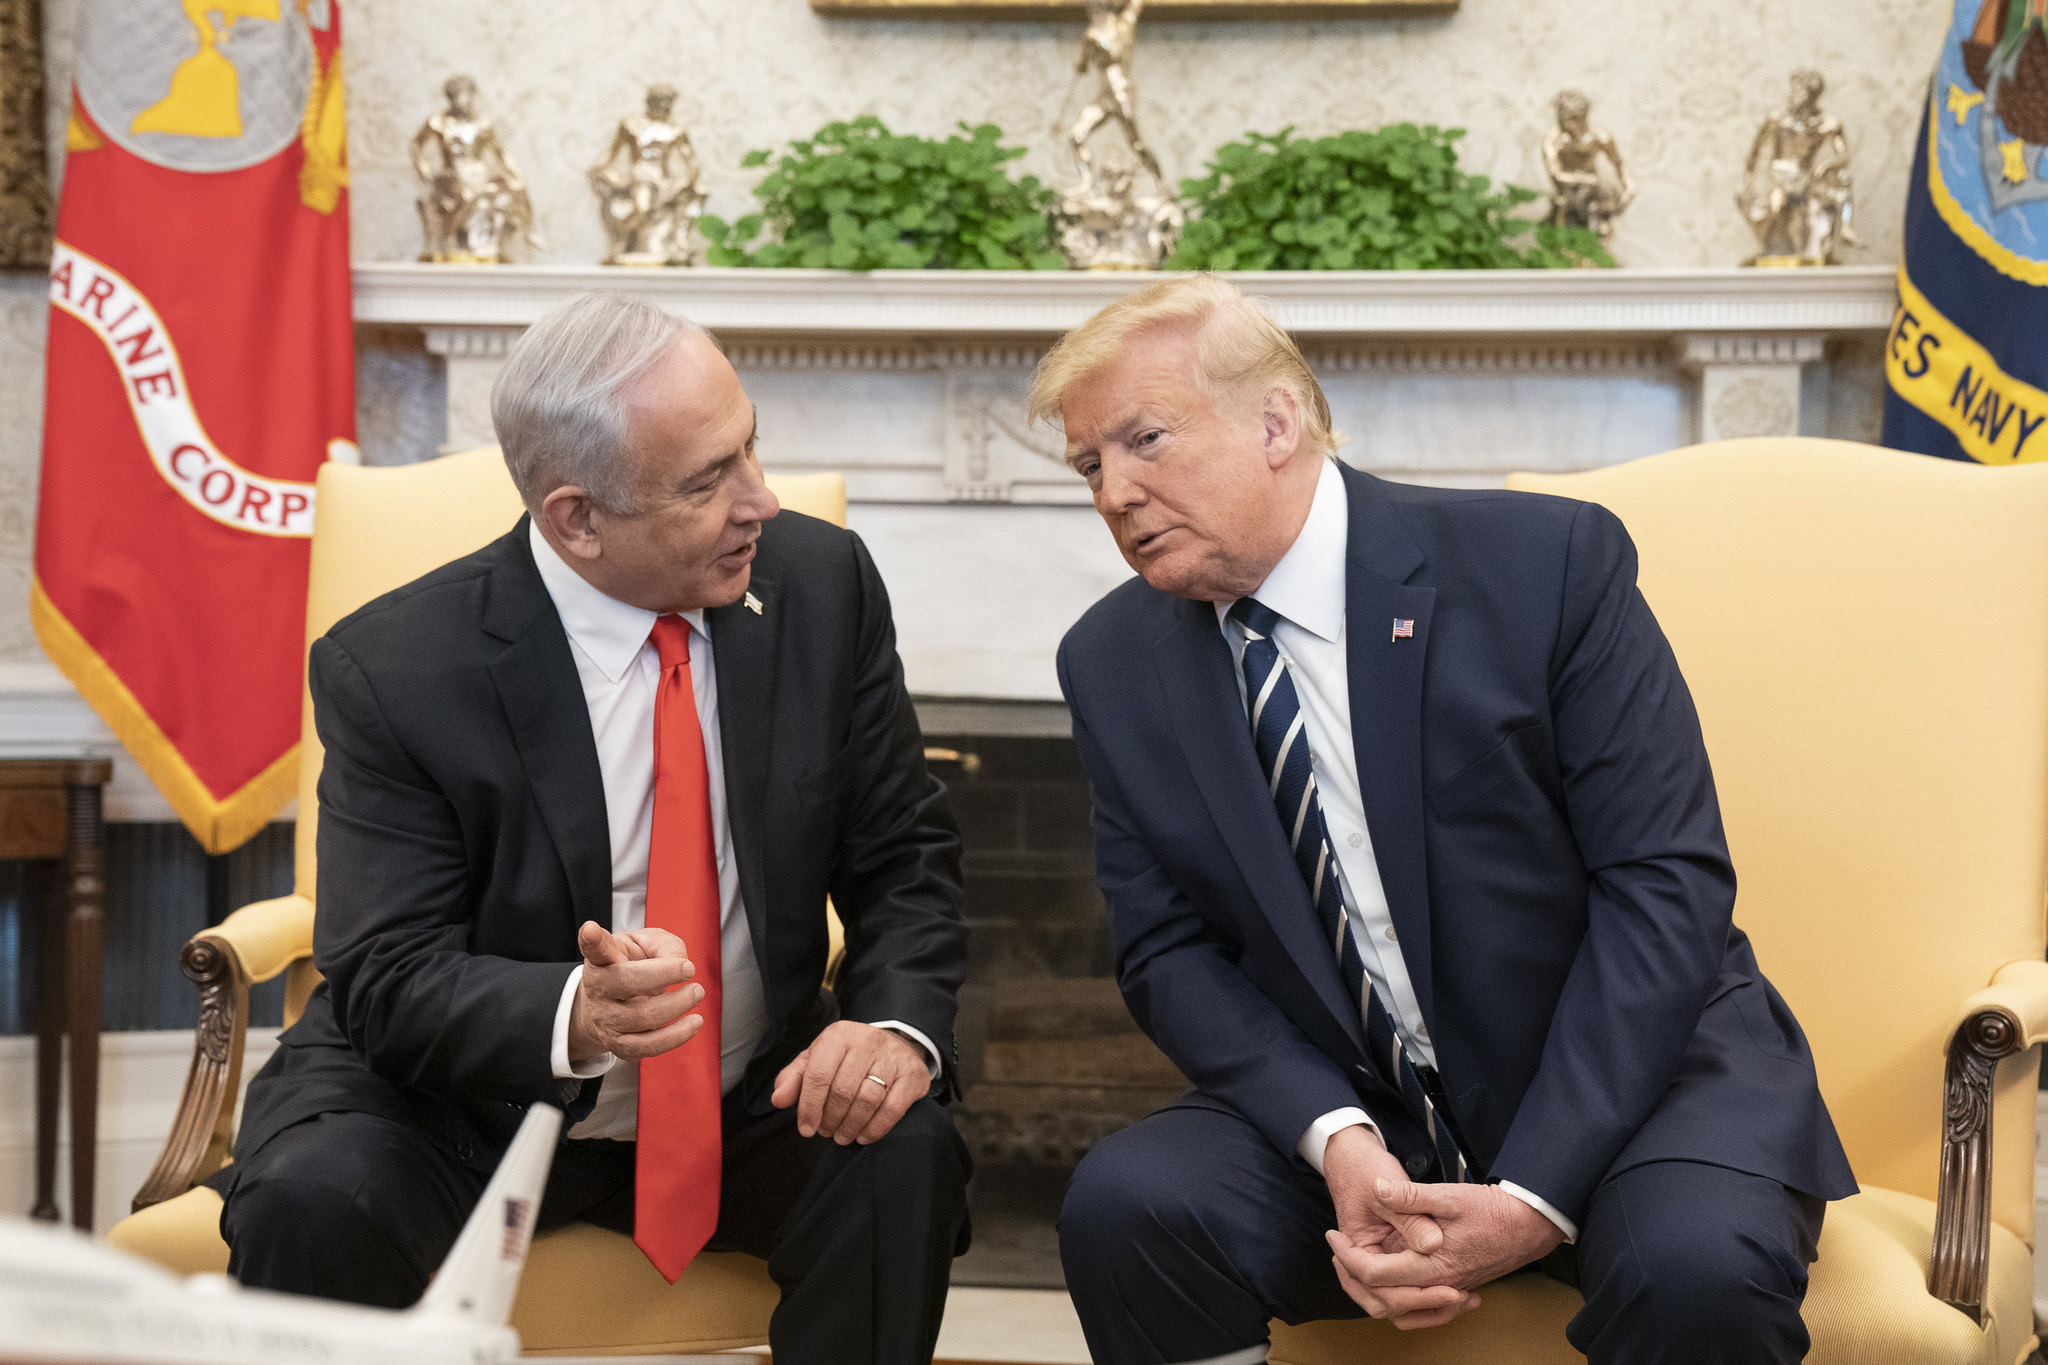 Trump lanza plan de paz para Oriente Próximo que palestinos rechazan